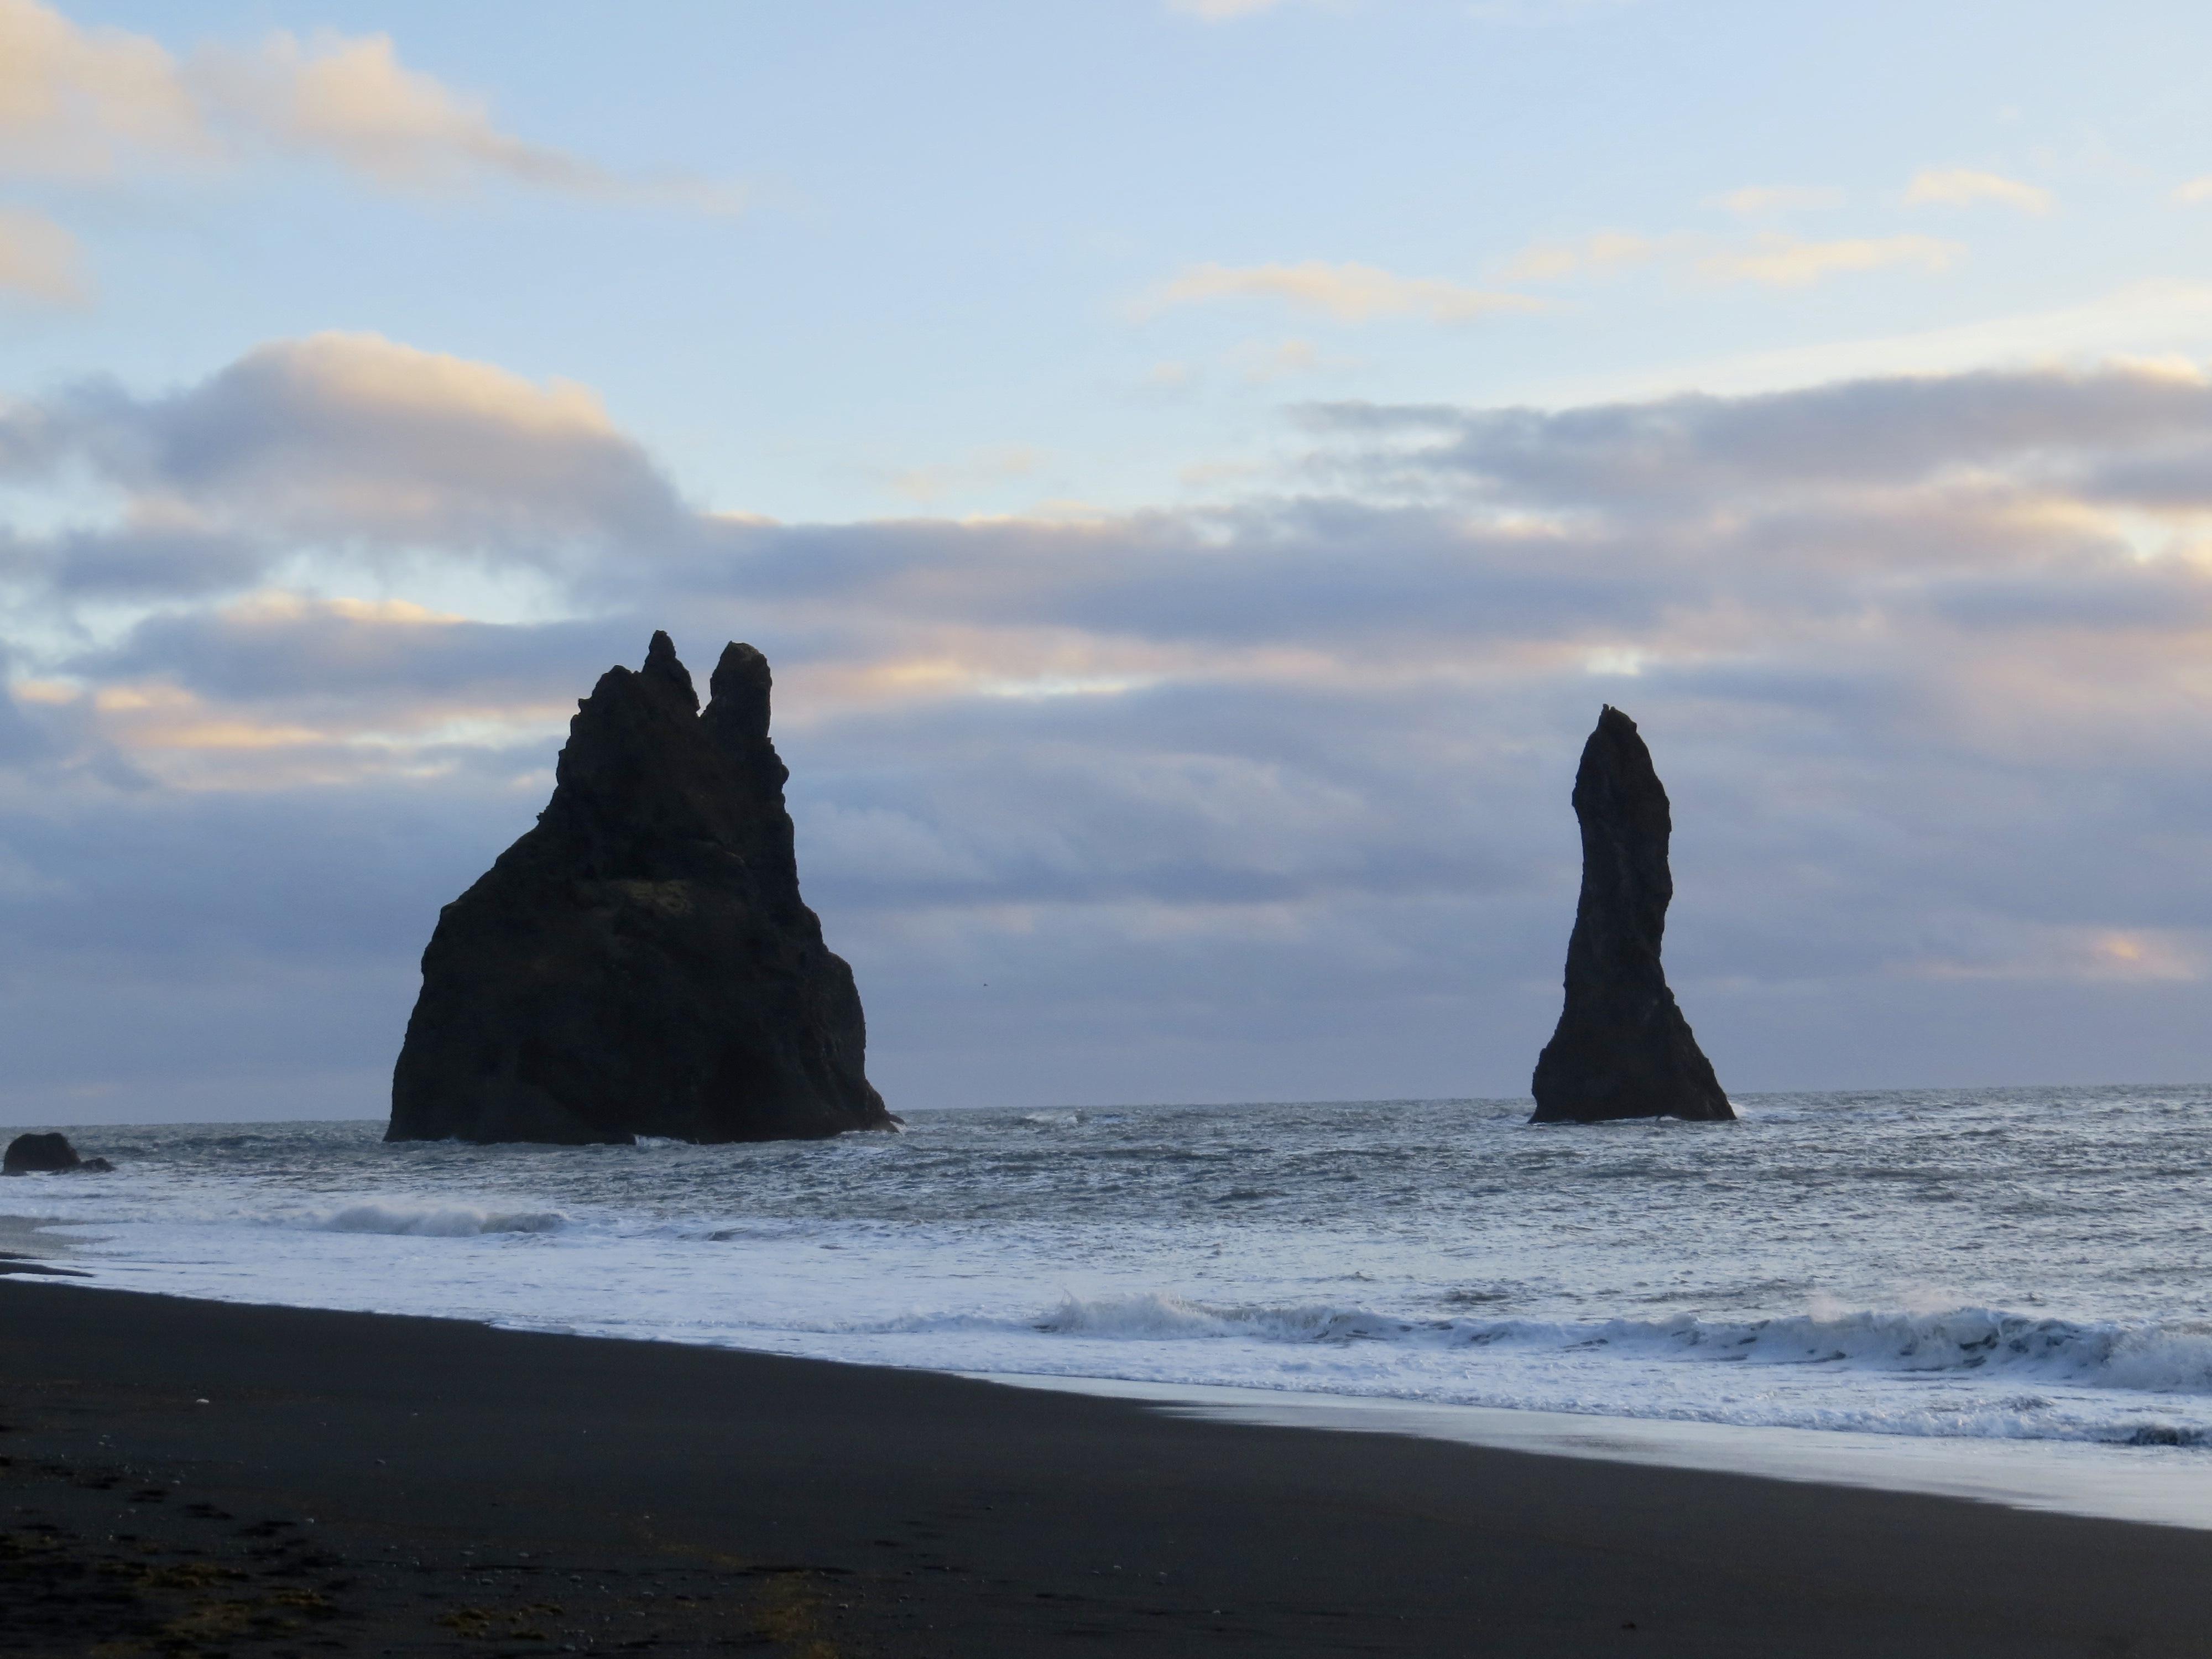 Reynisdrangar iceland, 3 ships black beach